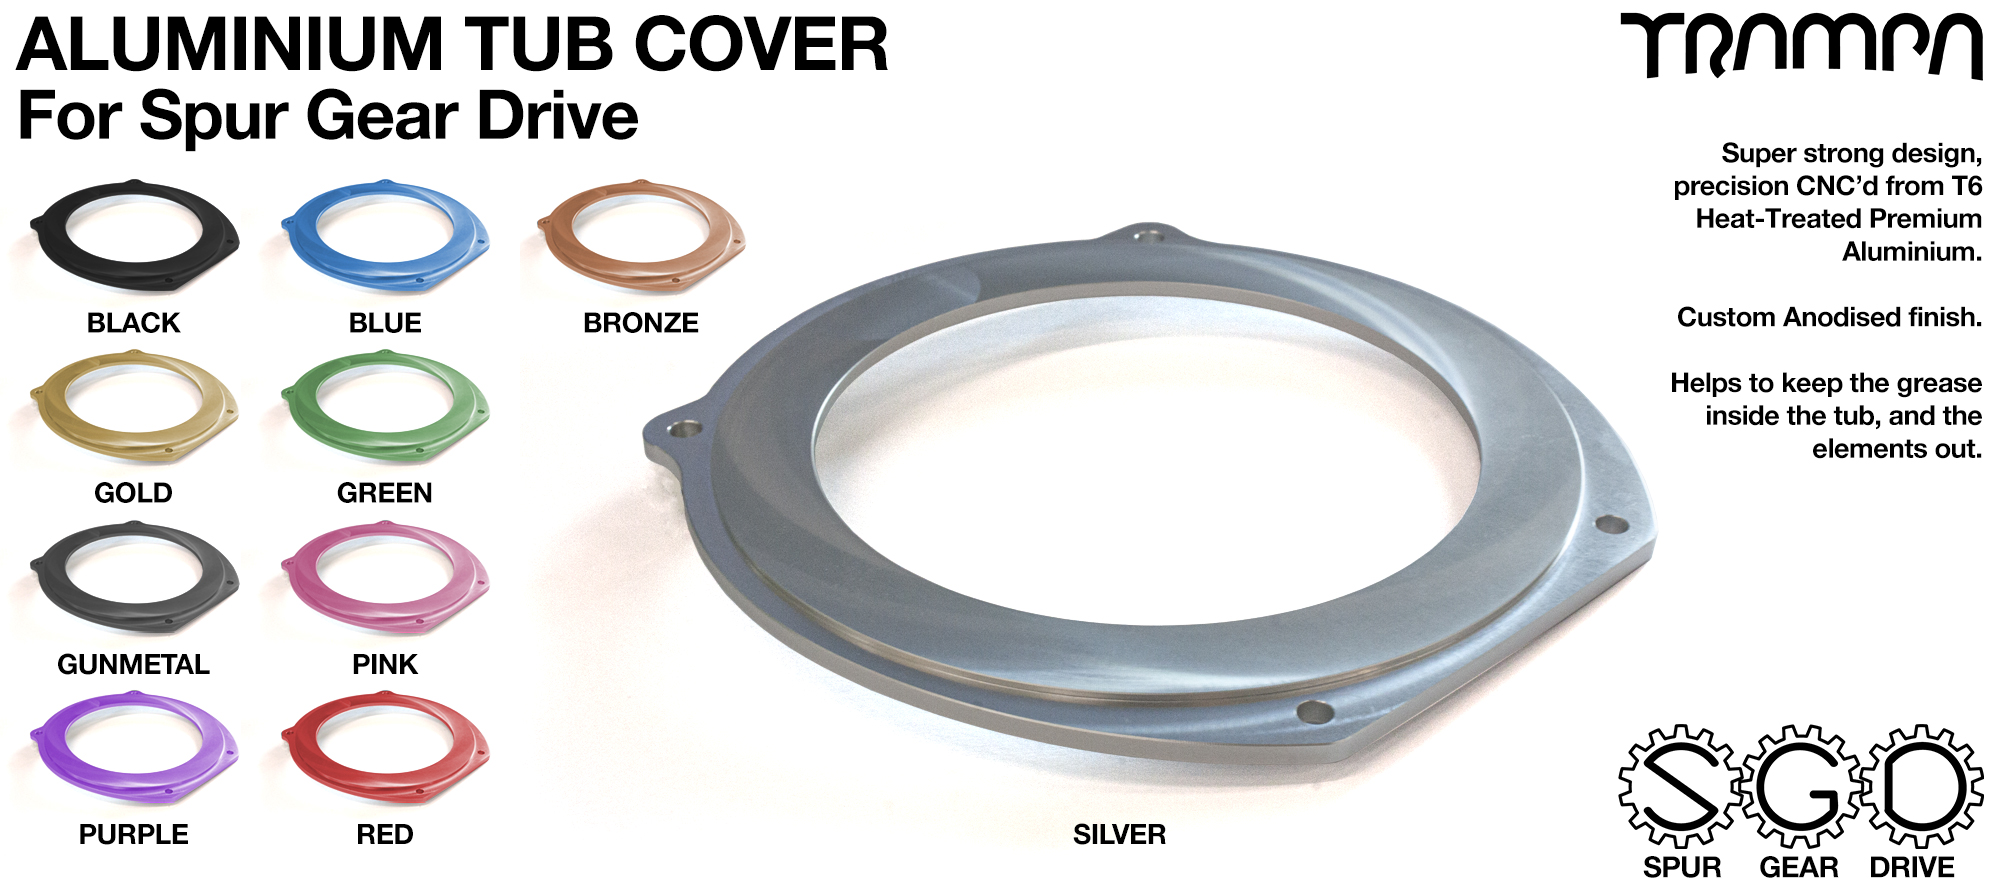 TRAMPA MKII Spur Gear Drive T6 Aluminium Tub Cover